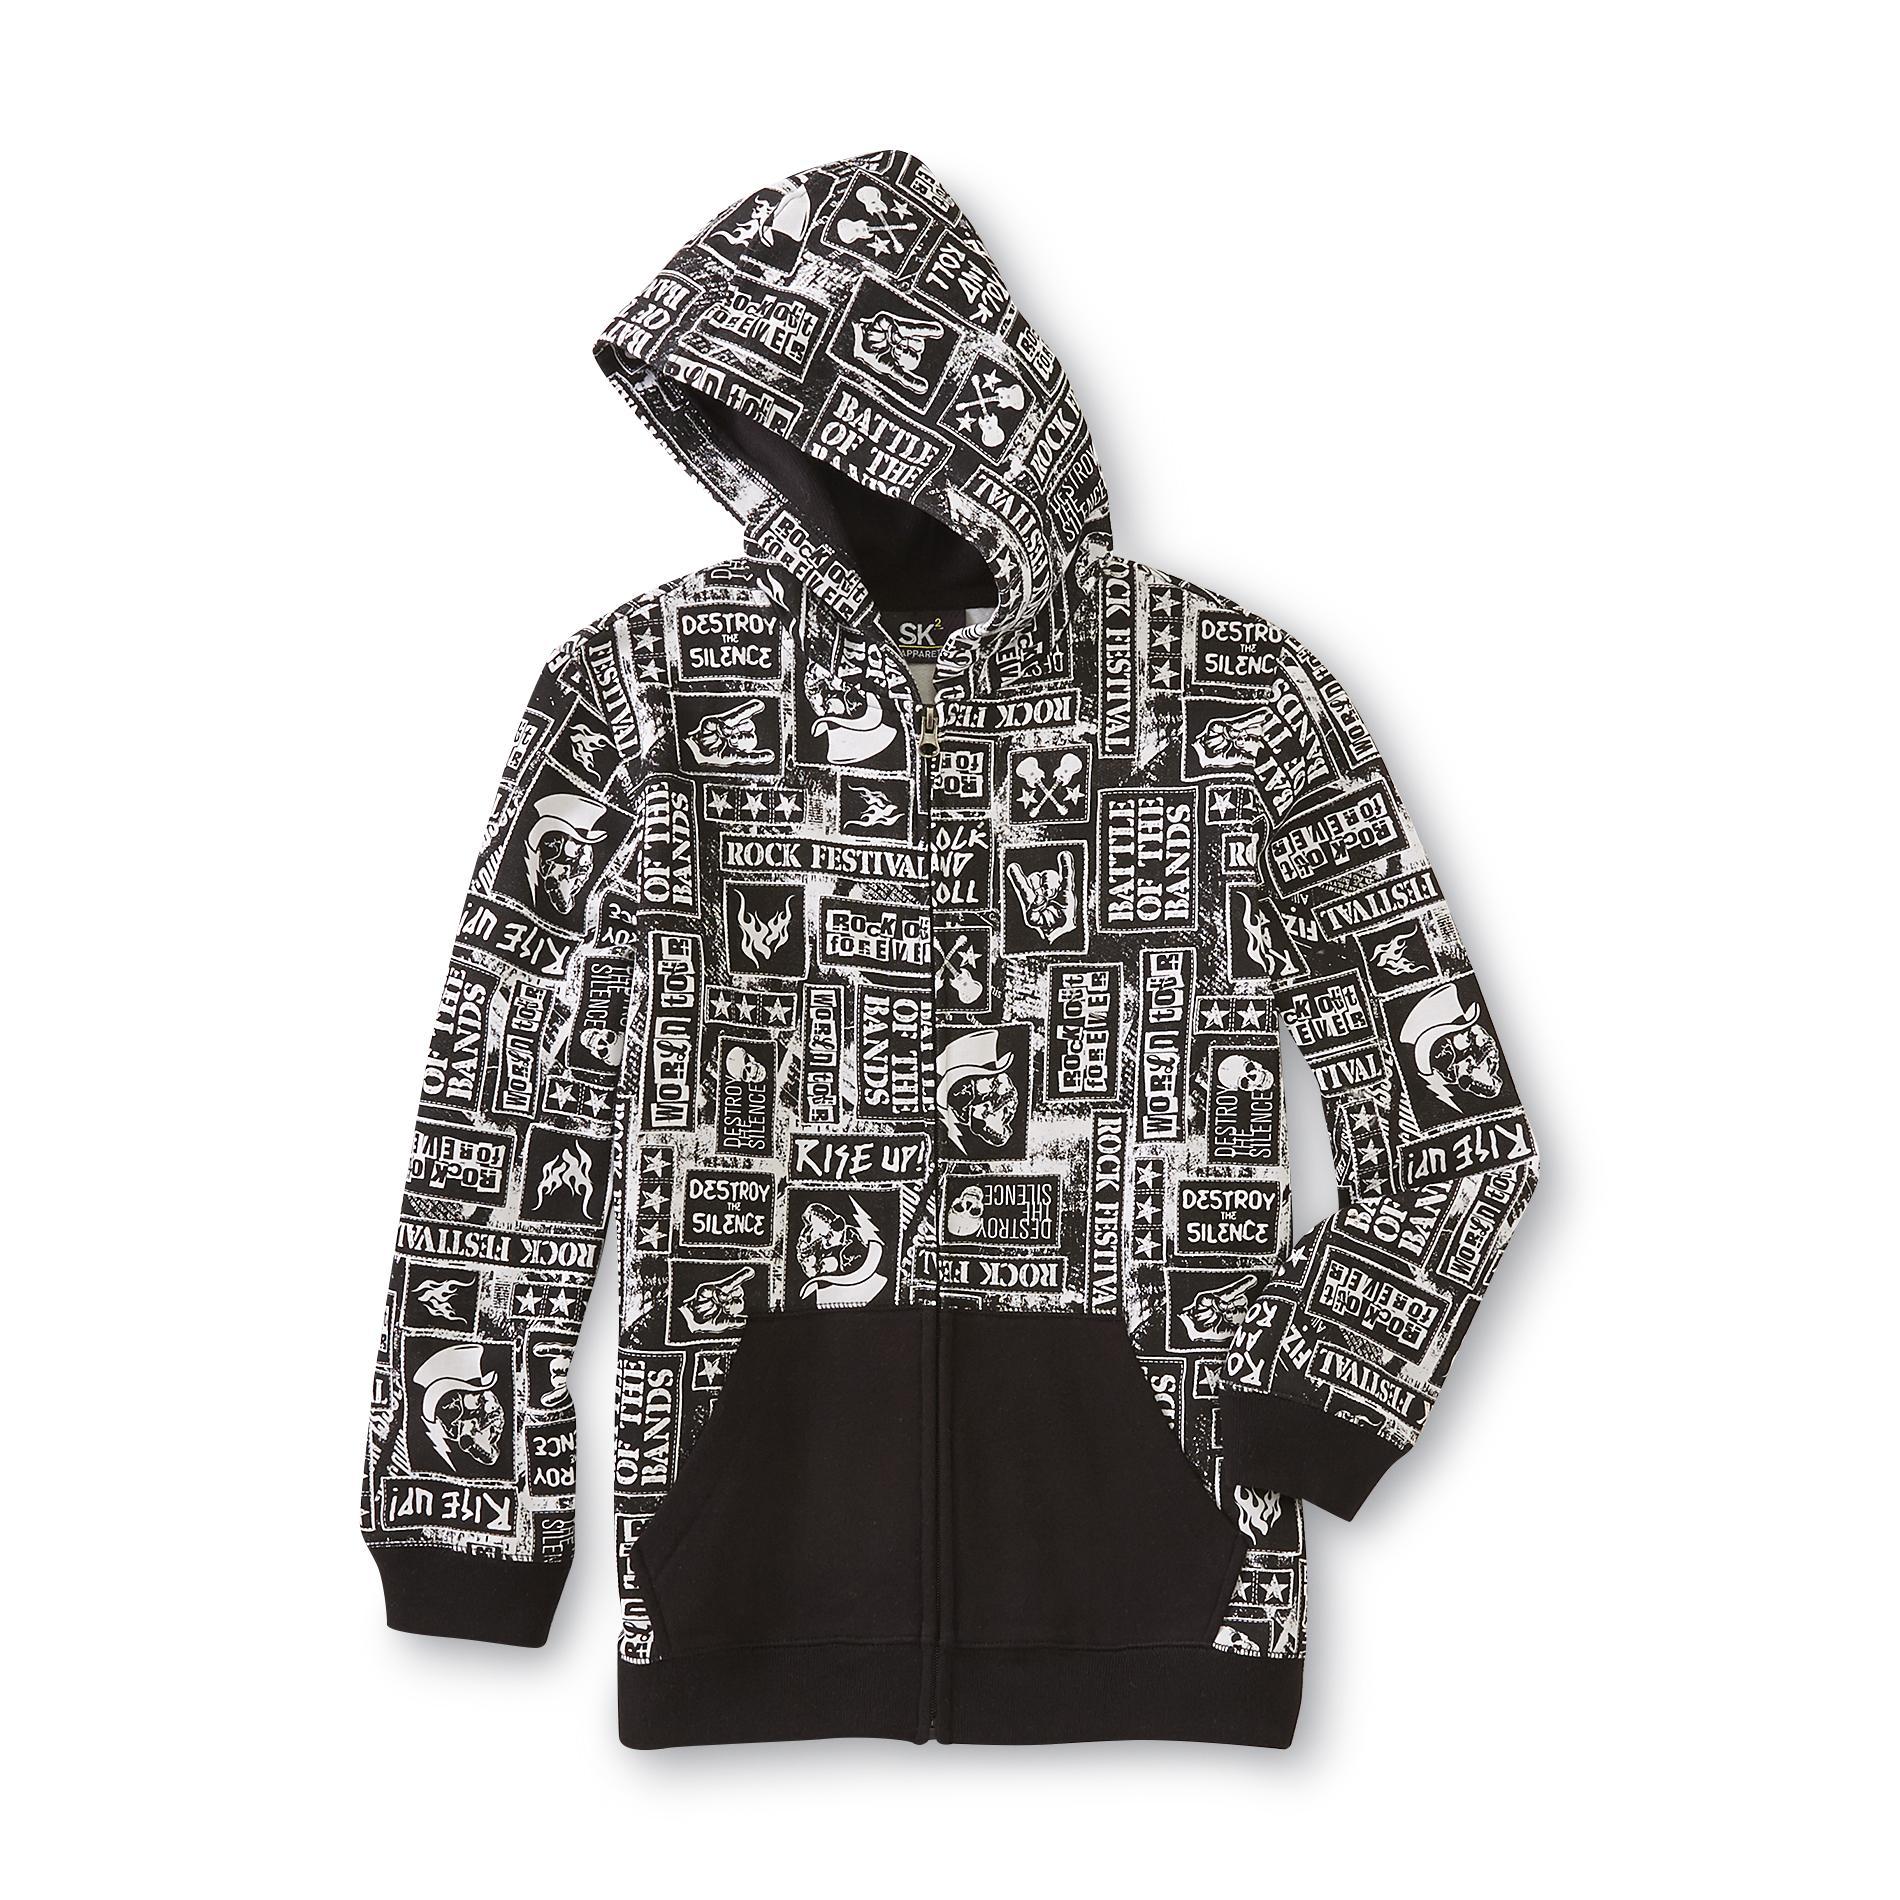 SK2 Boy's Hoodie Jacket - Rock 'N' Roll Print PartNumber: 049VA83307512P MfgPartNumber: BF5SK71412BB